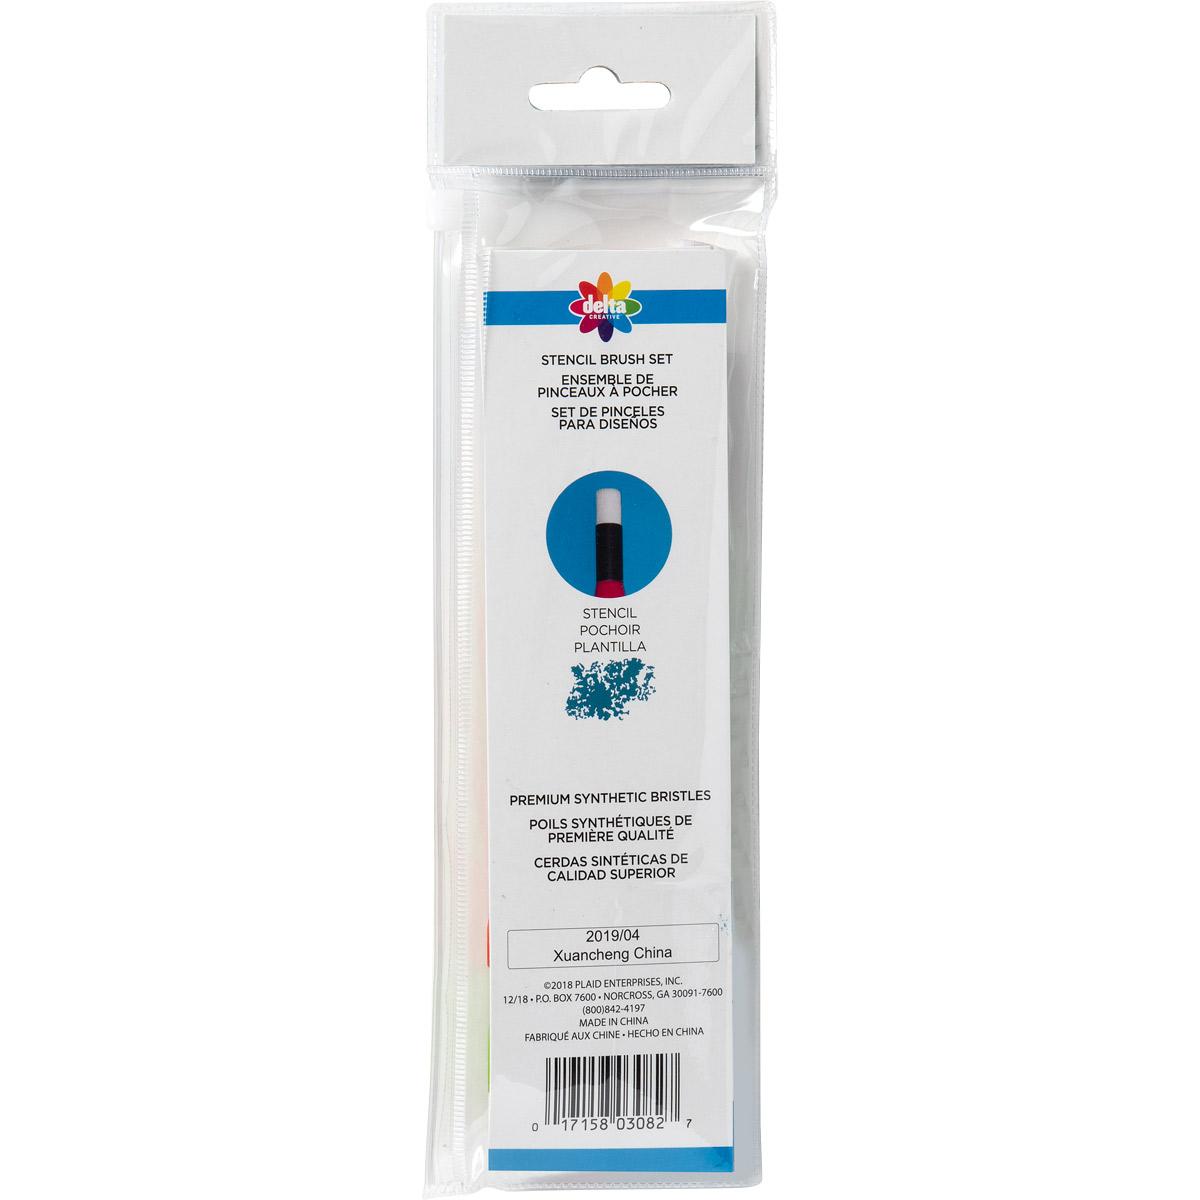 Delta Ceramcoat ® Brush Sets - Stencil Set, 3 pc. - 03082